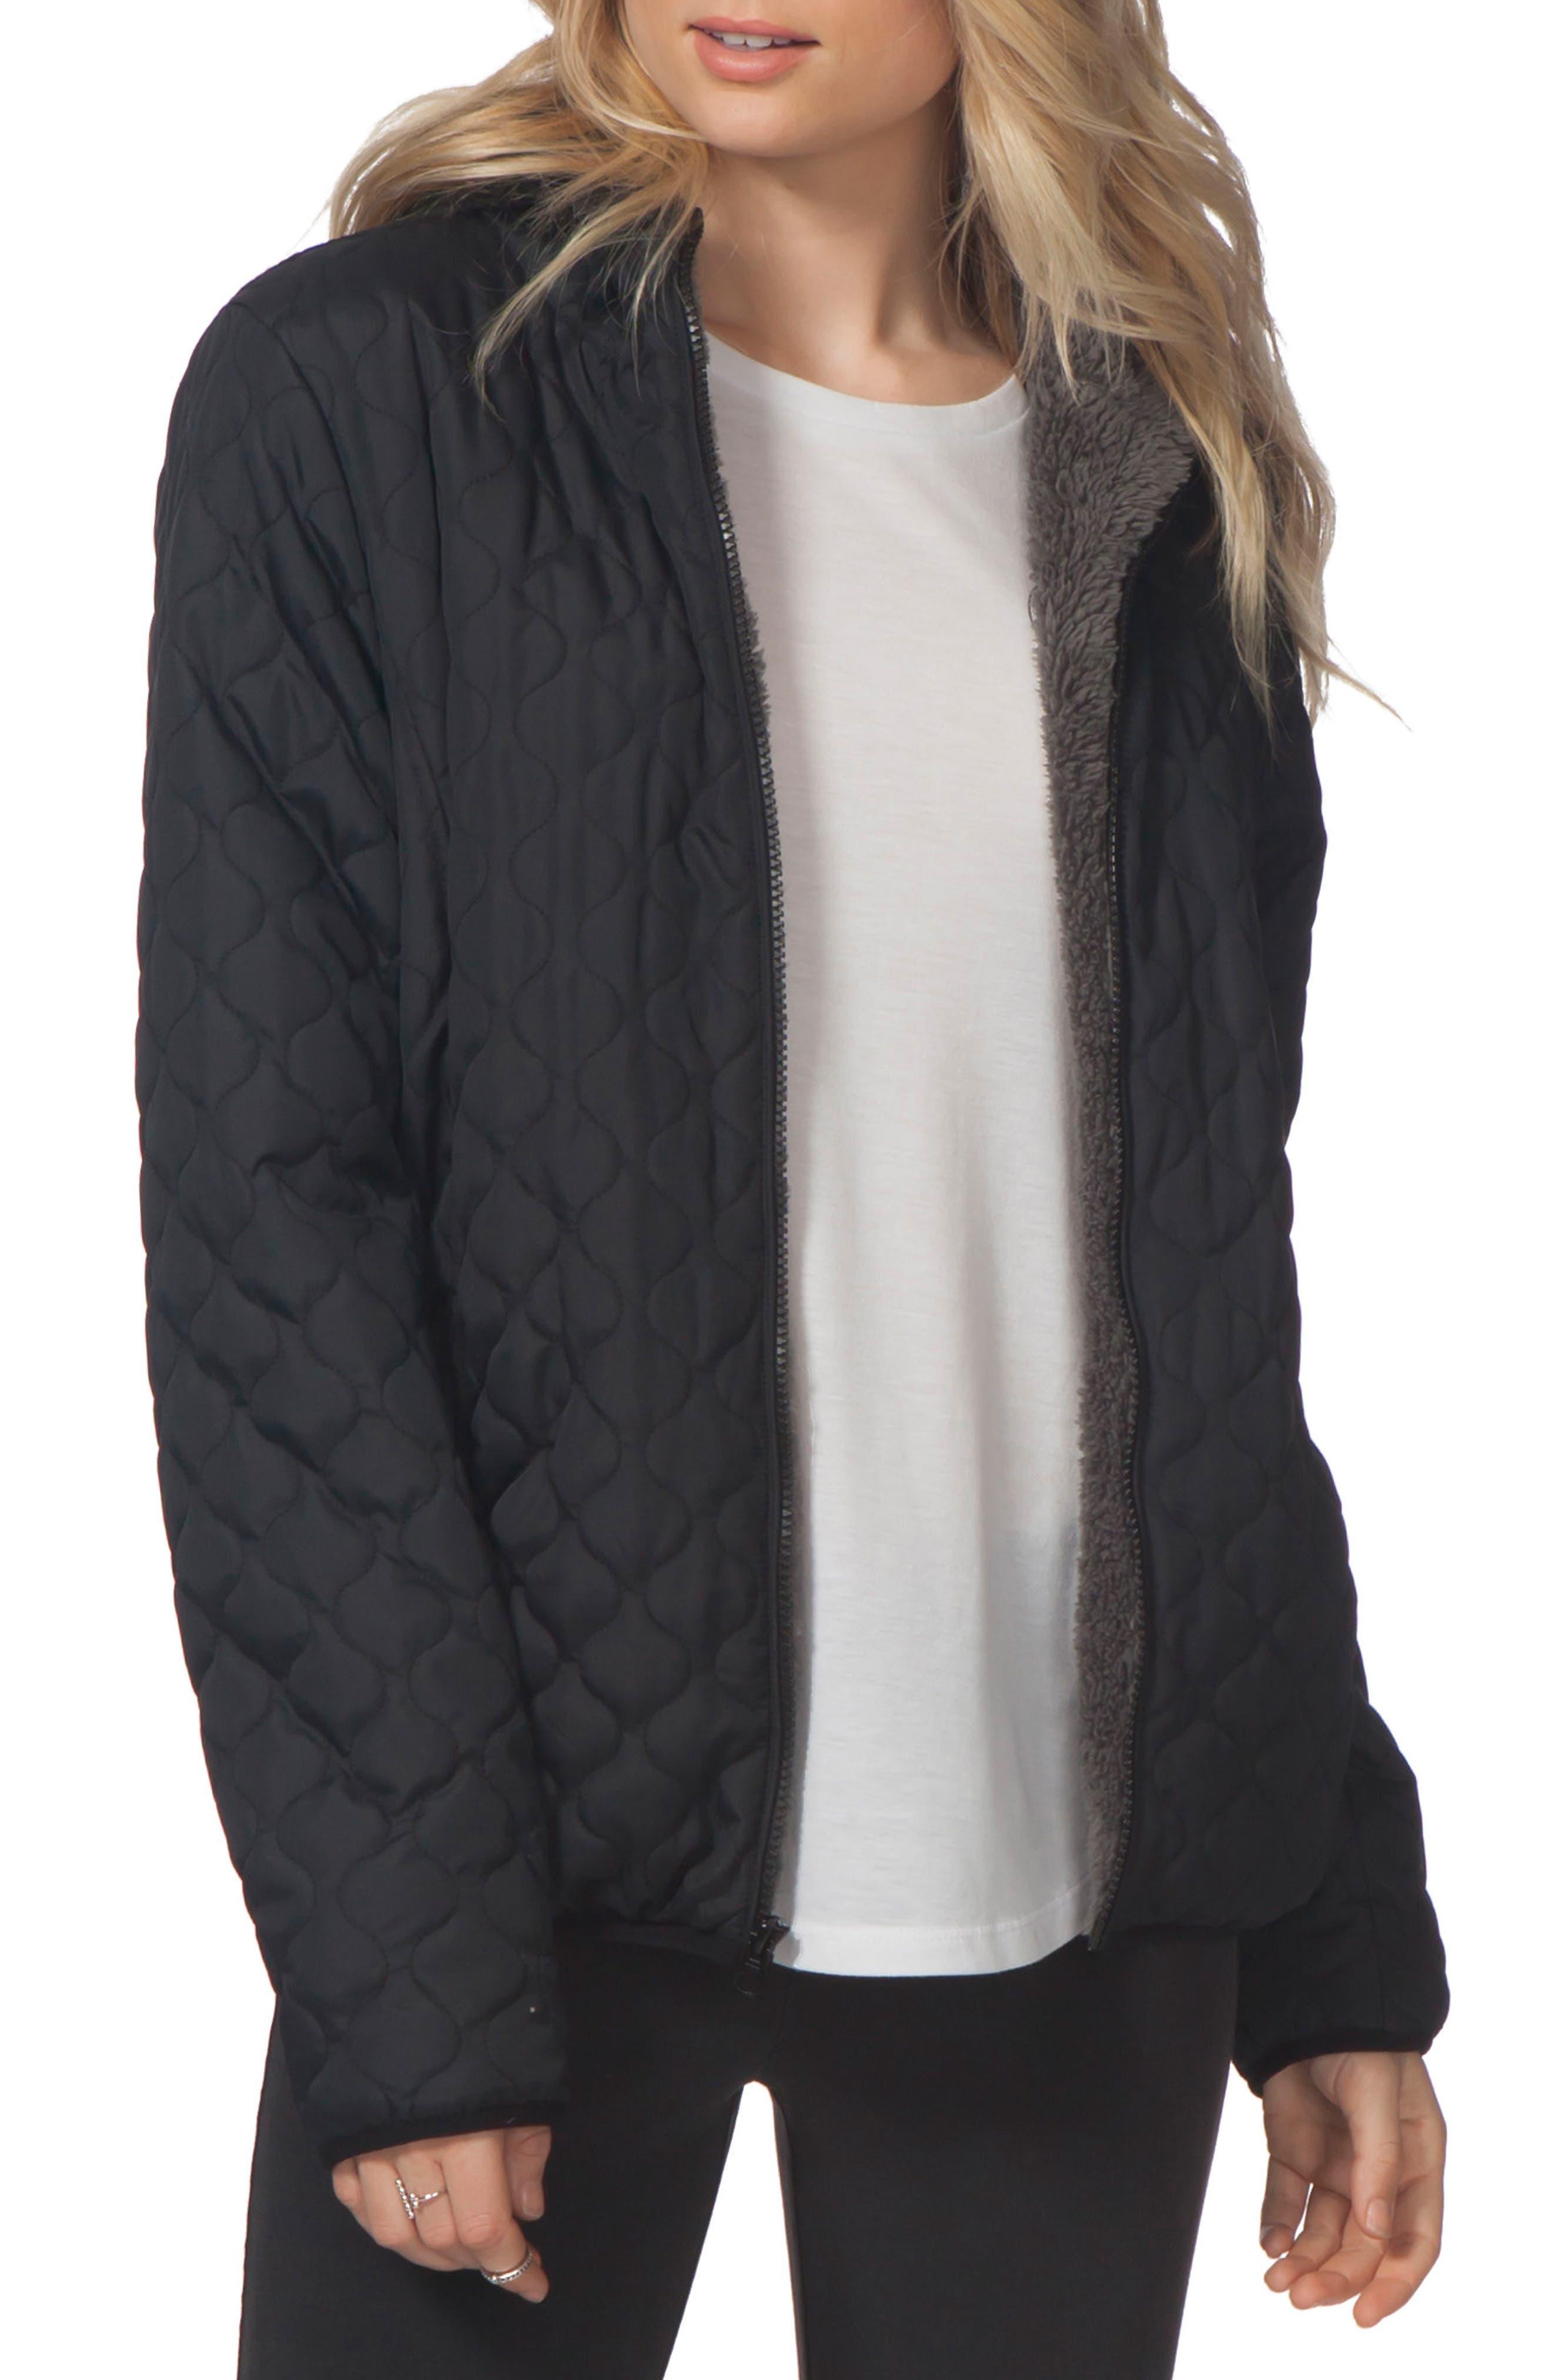 Anoeta Anti Series Jacket,                         Main,                         color,